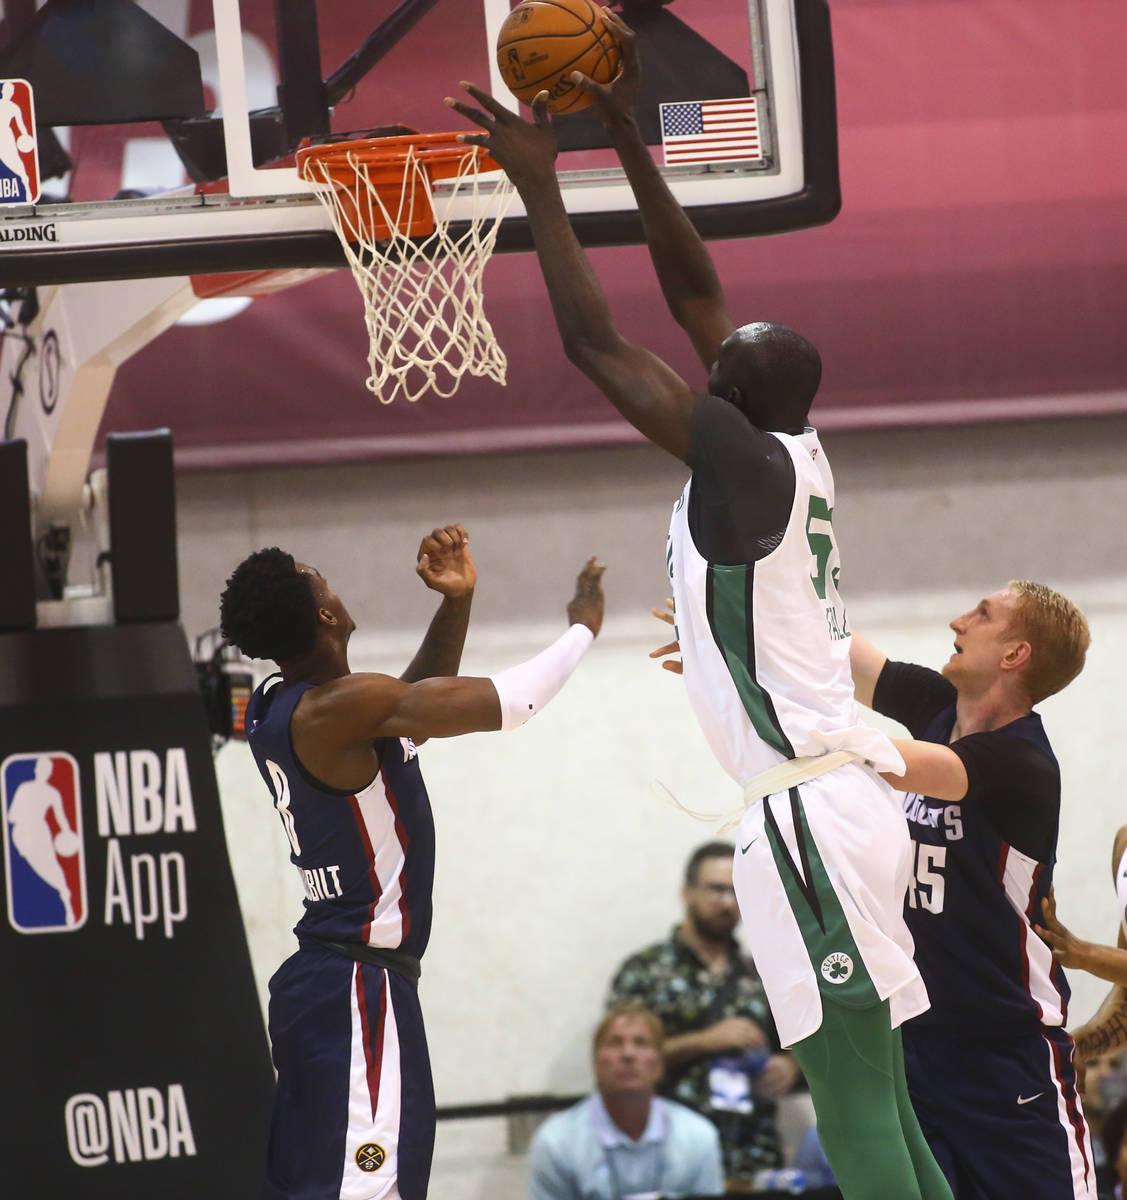 Boston Celtics' Tacko Fall (55) shoots over Denver Nuggets' Jarred Vanderbilt during a basketba ...